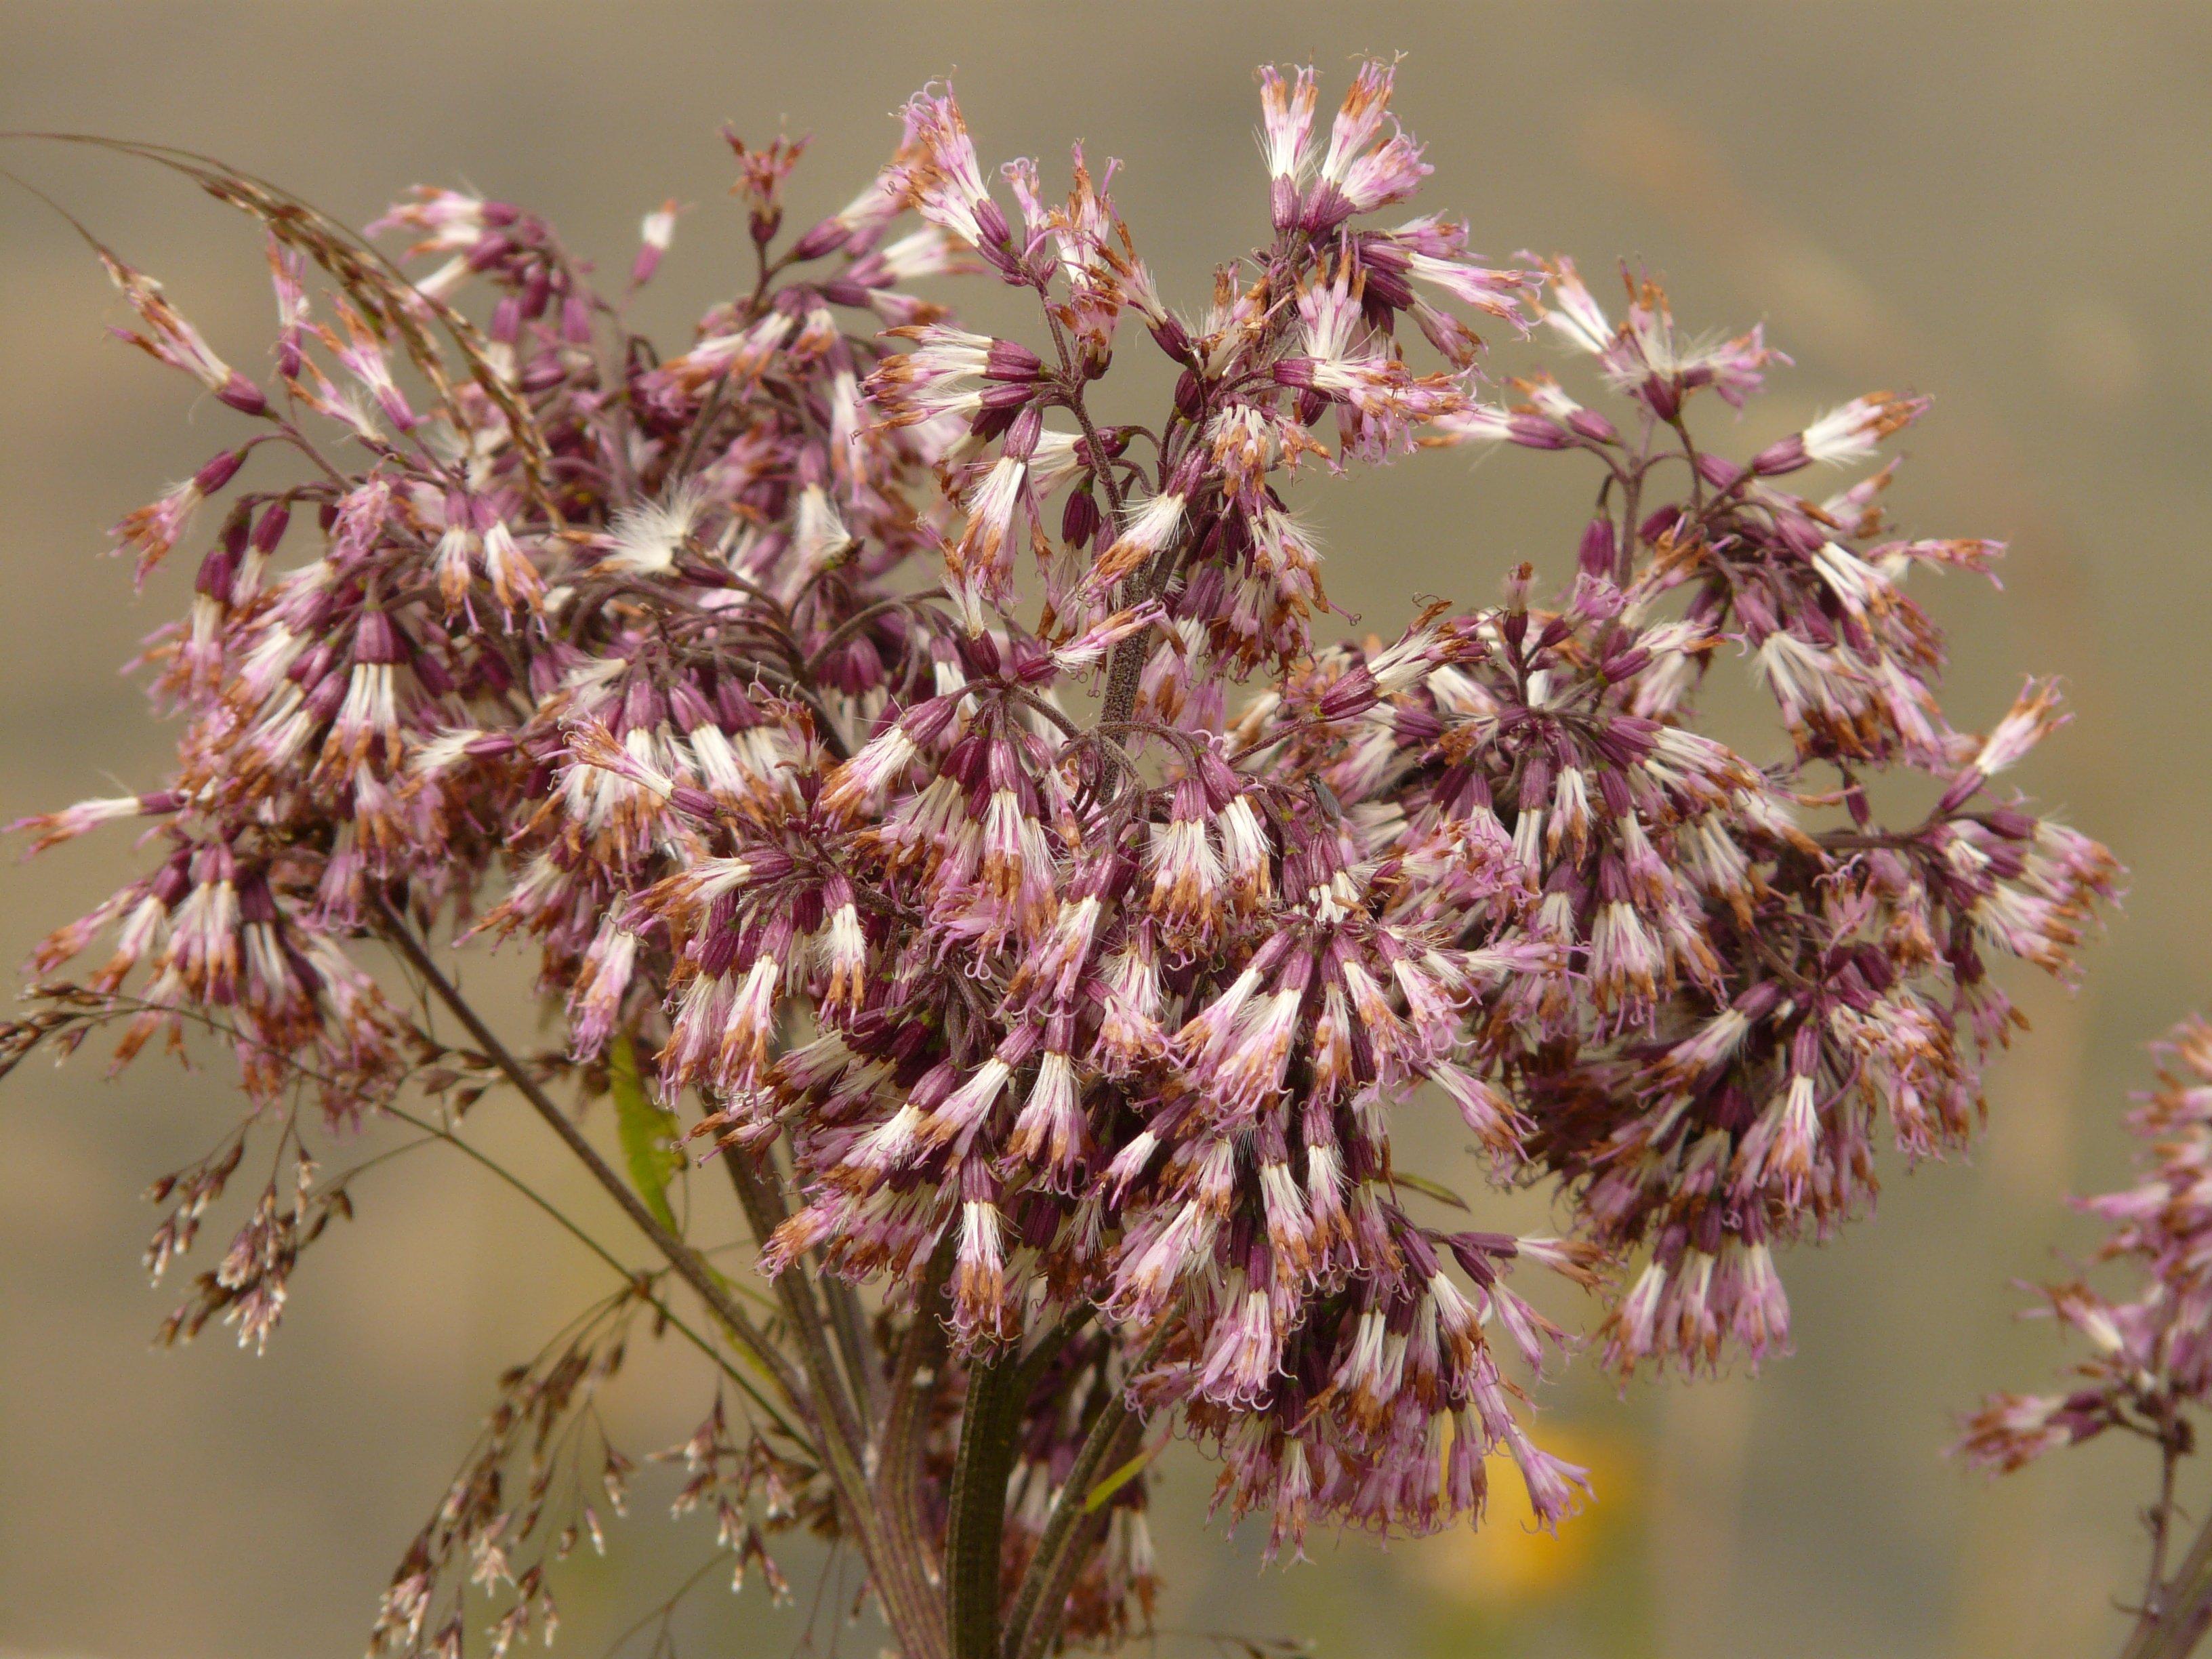 banco de imagens rvore ramo flor plantar folha flor ptala primavera erva produzir botnica flora galho flores silvestres arbusto